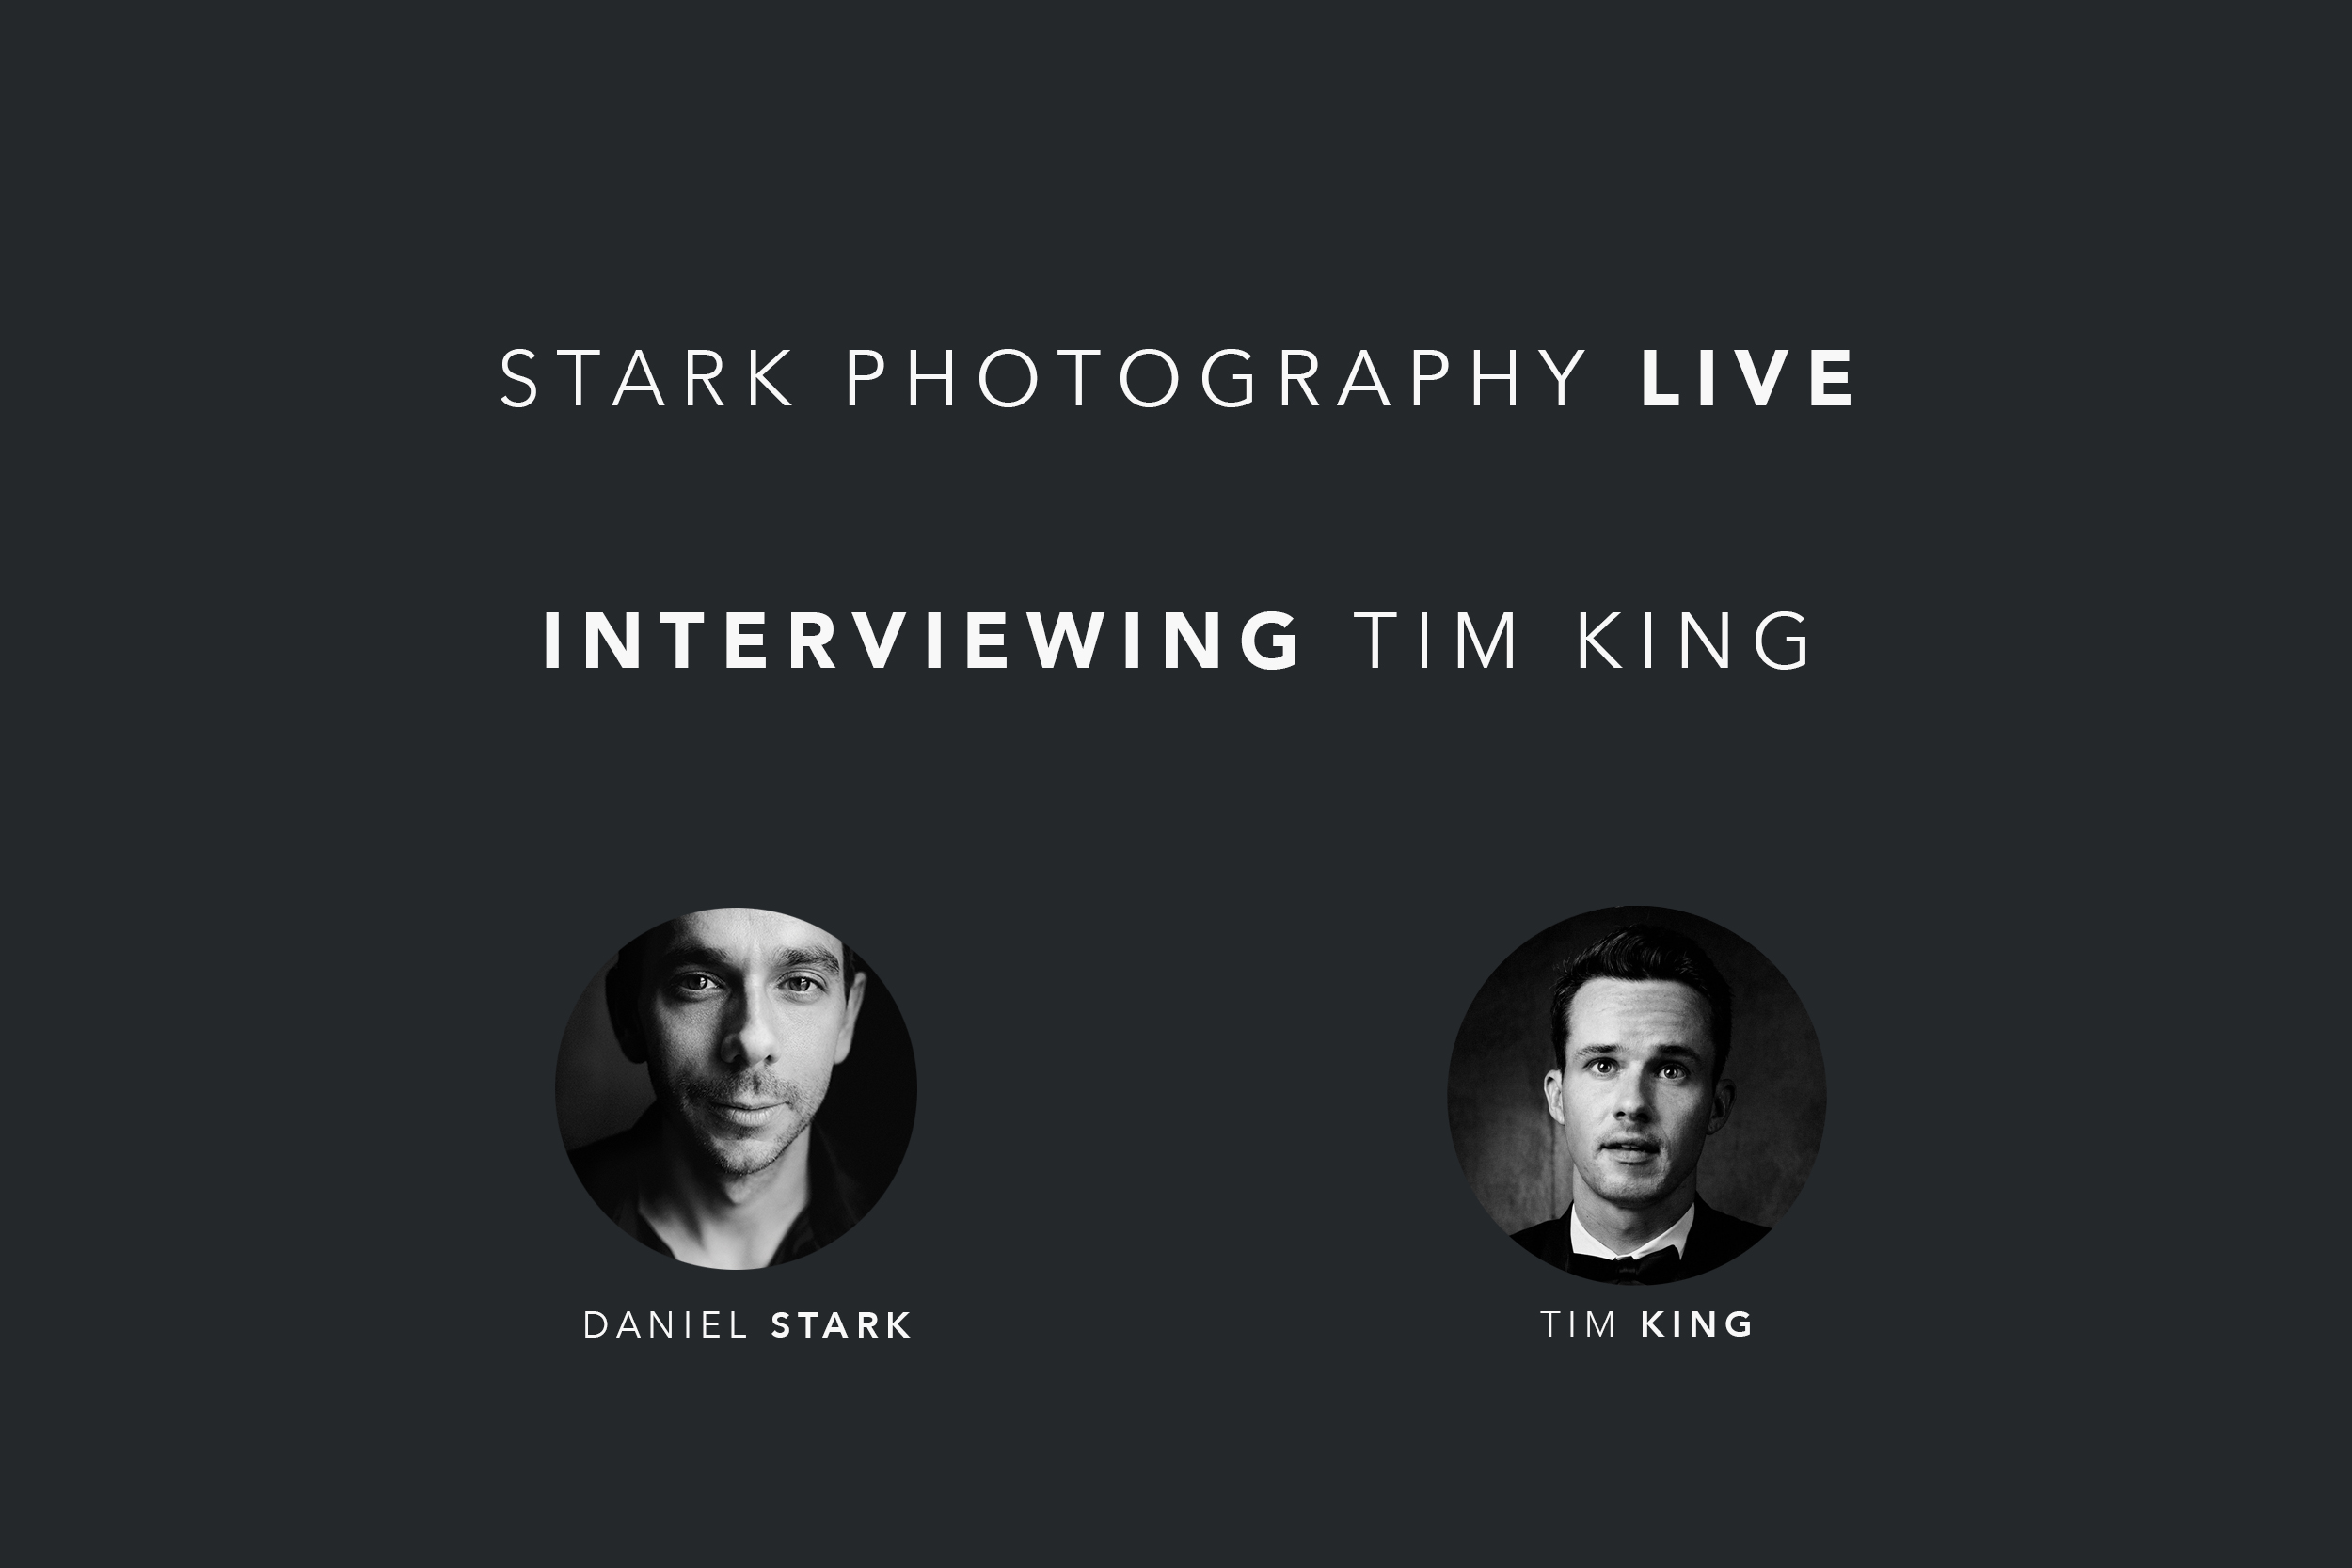 Stark Photography LIVE